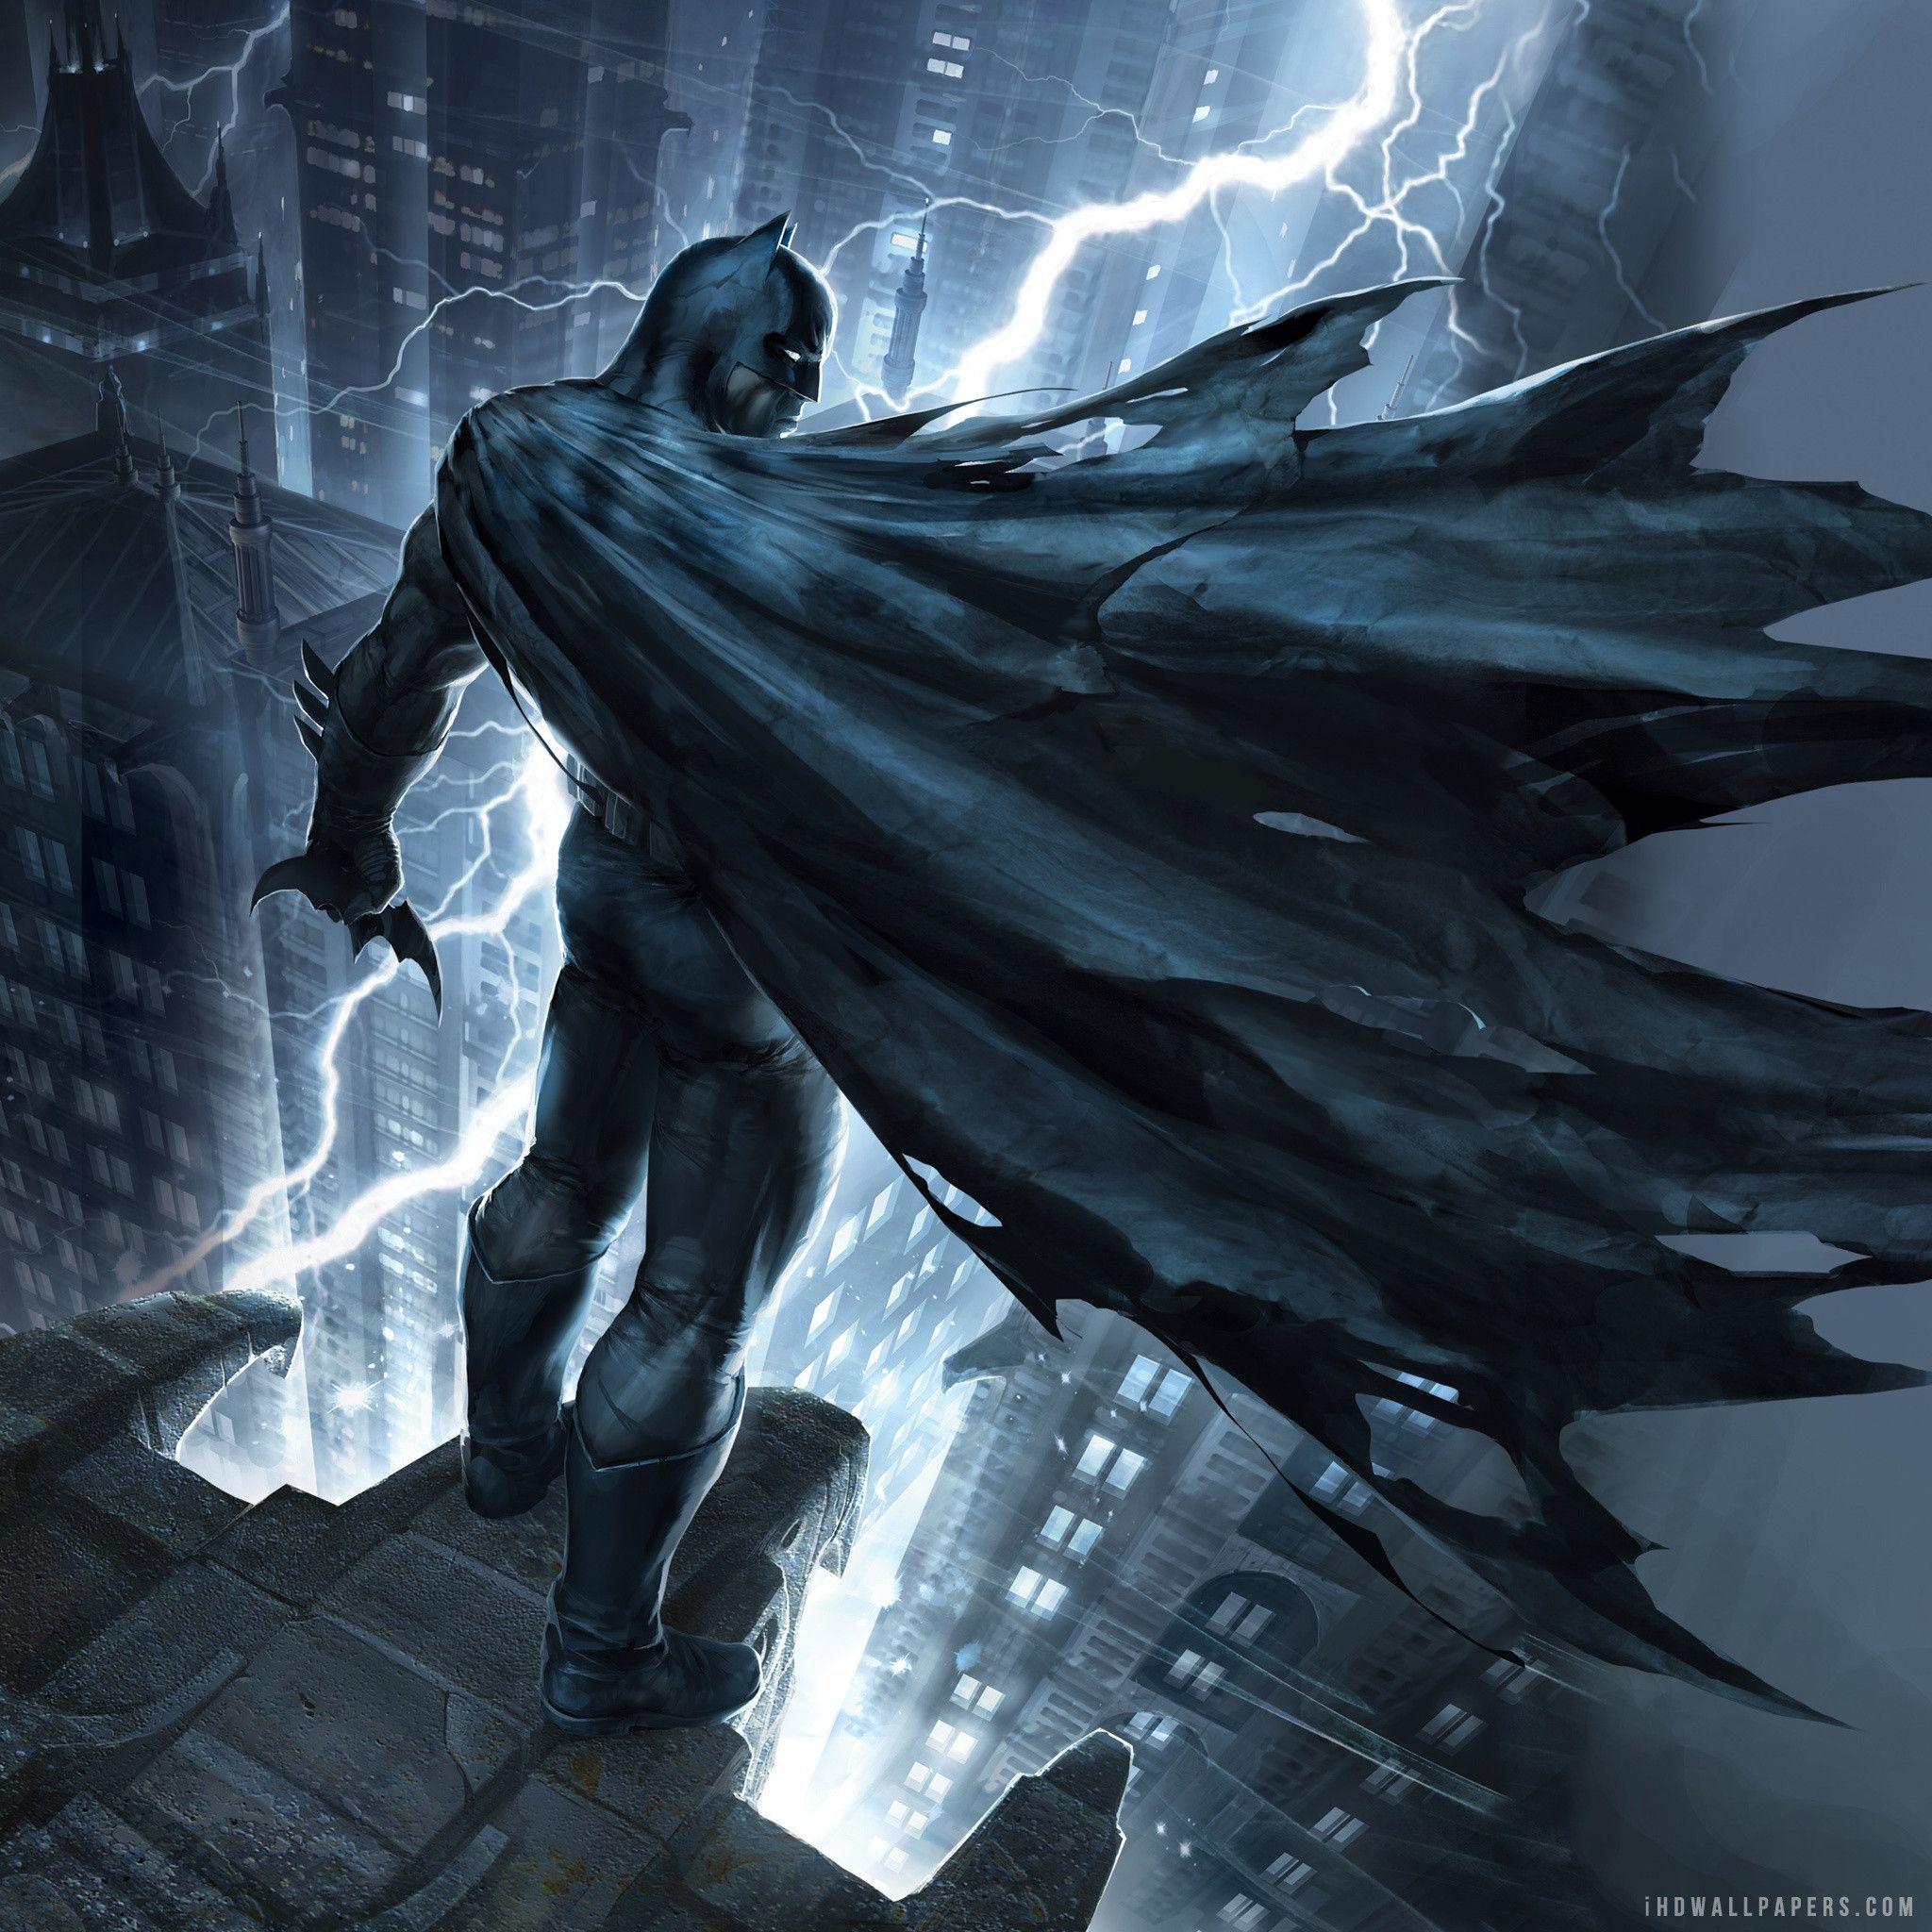 batman knight dark returns artwork poster dc comics wallpapers digital deviantart rain superheroes rock gotham geek iphone superman posters wallpapercave